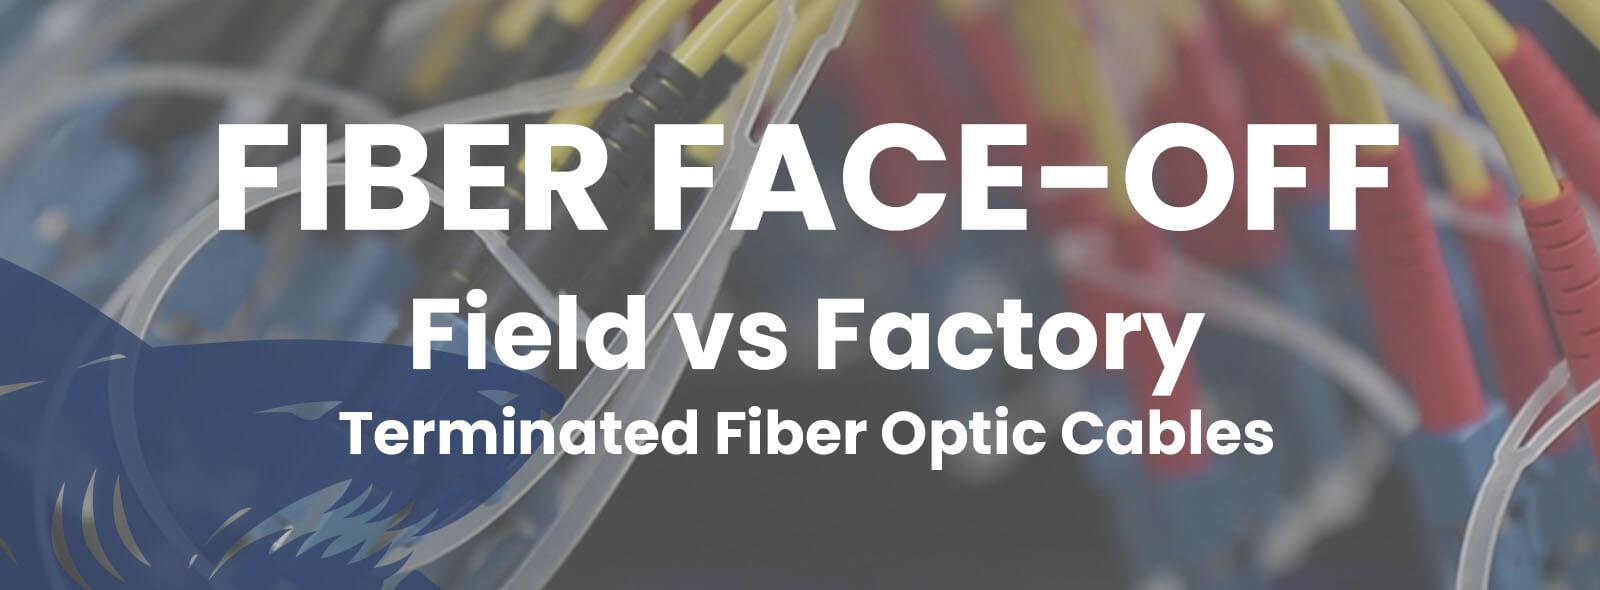 Fiber Face-Off: Field vs Factory Terminated Fiber Optic Cables